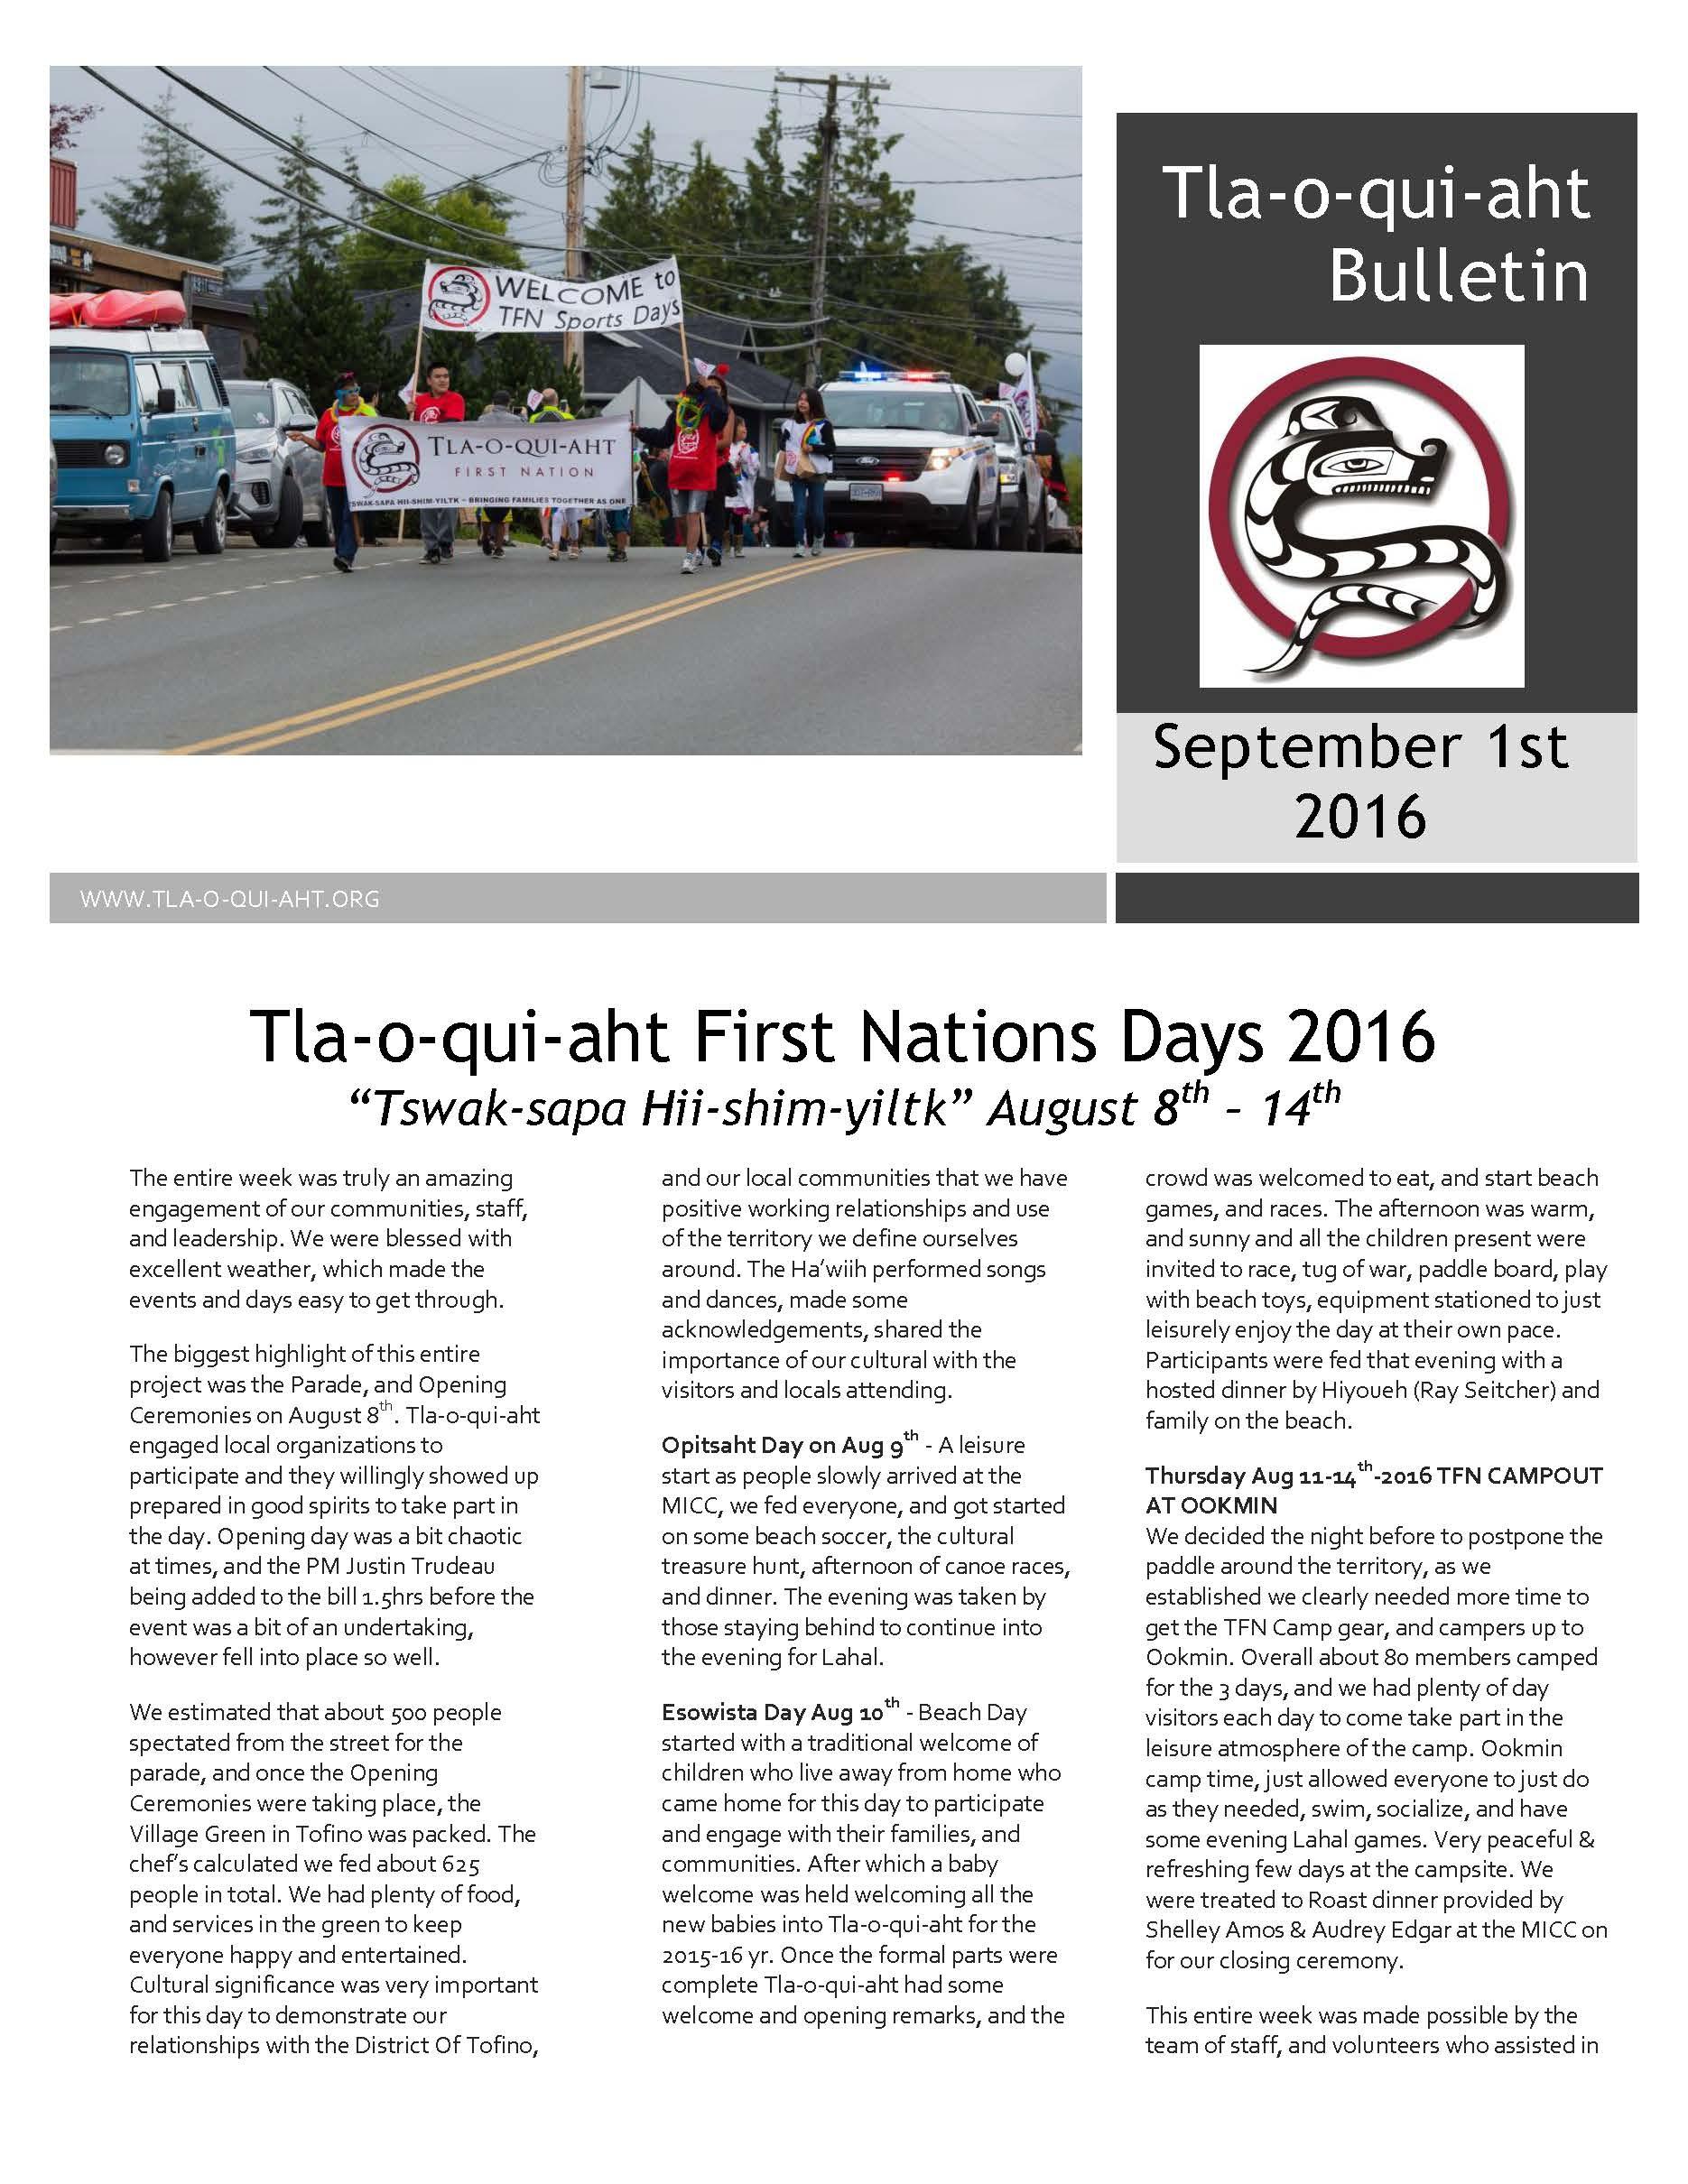 TFN Bulletin Sept 1-2016_Page_01.jpg